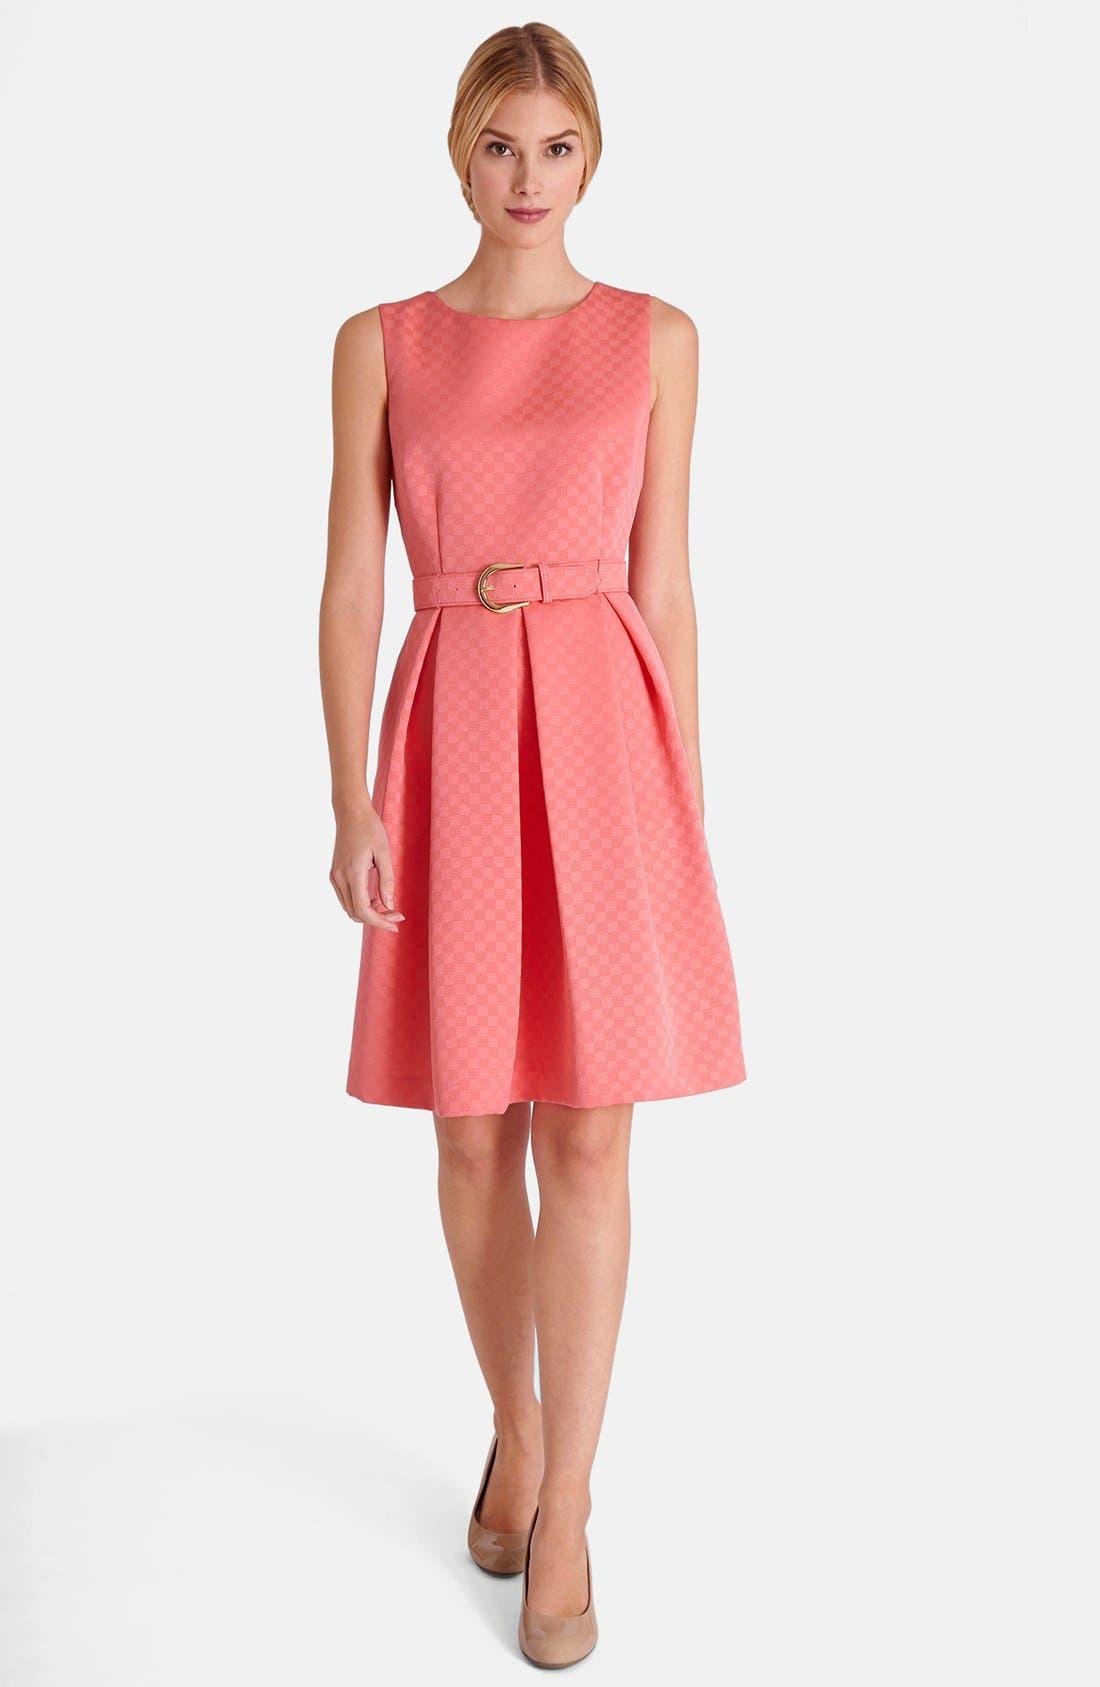 Alternate Image 1 Selected - Tahari Jacquard Fit & Flare Dress (Petite)